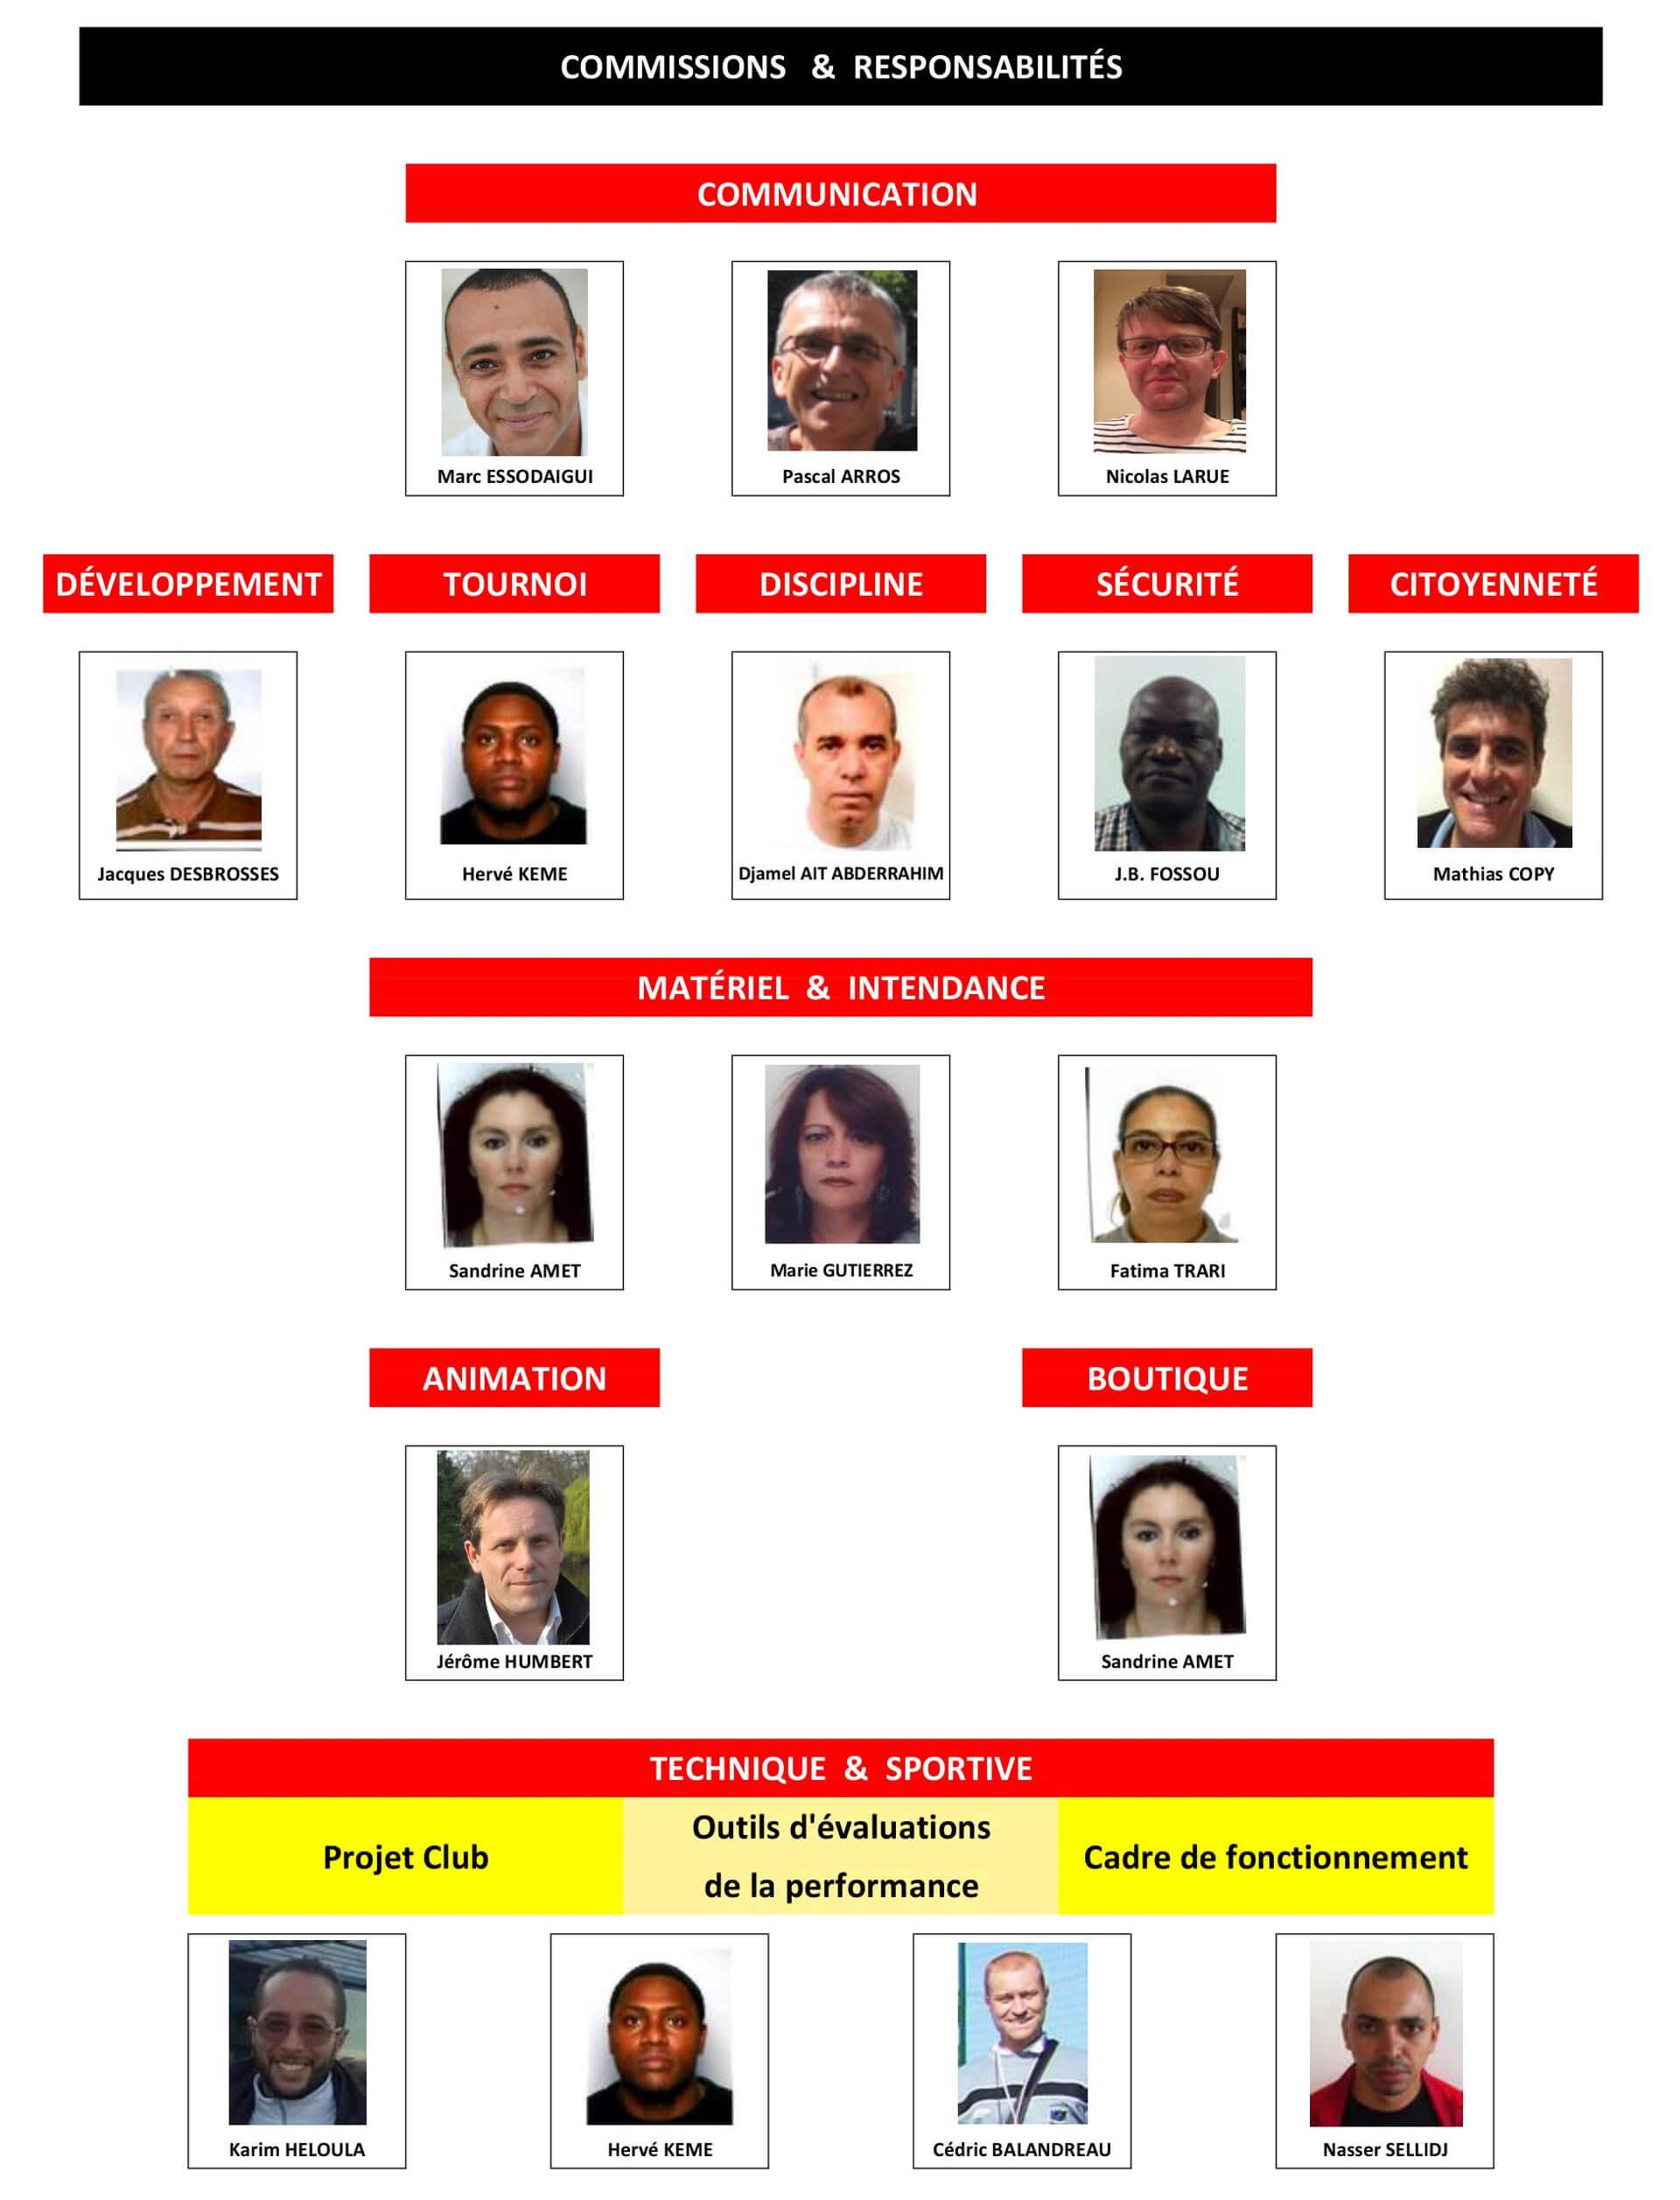 Organigramme des Commissions